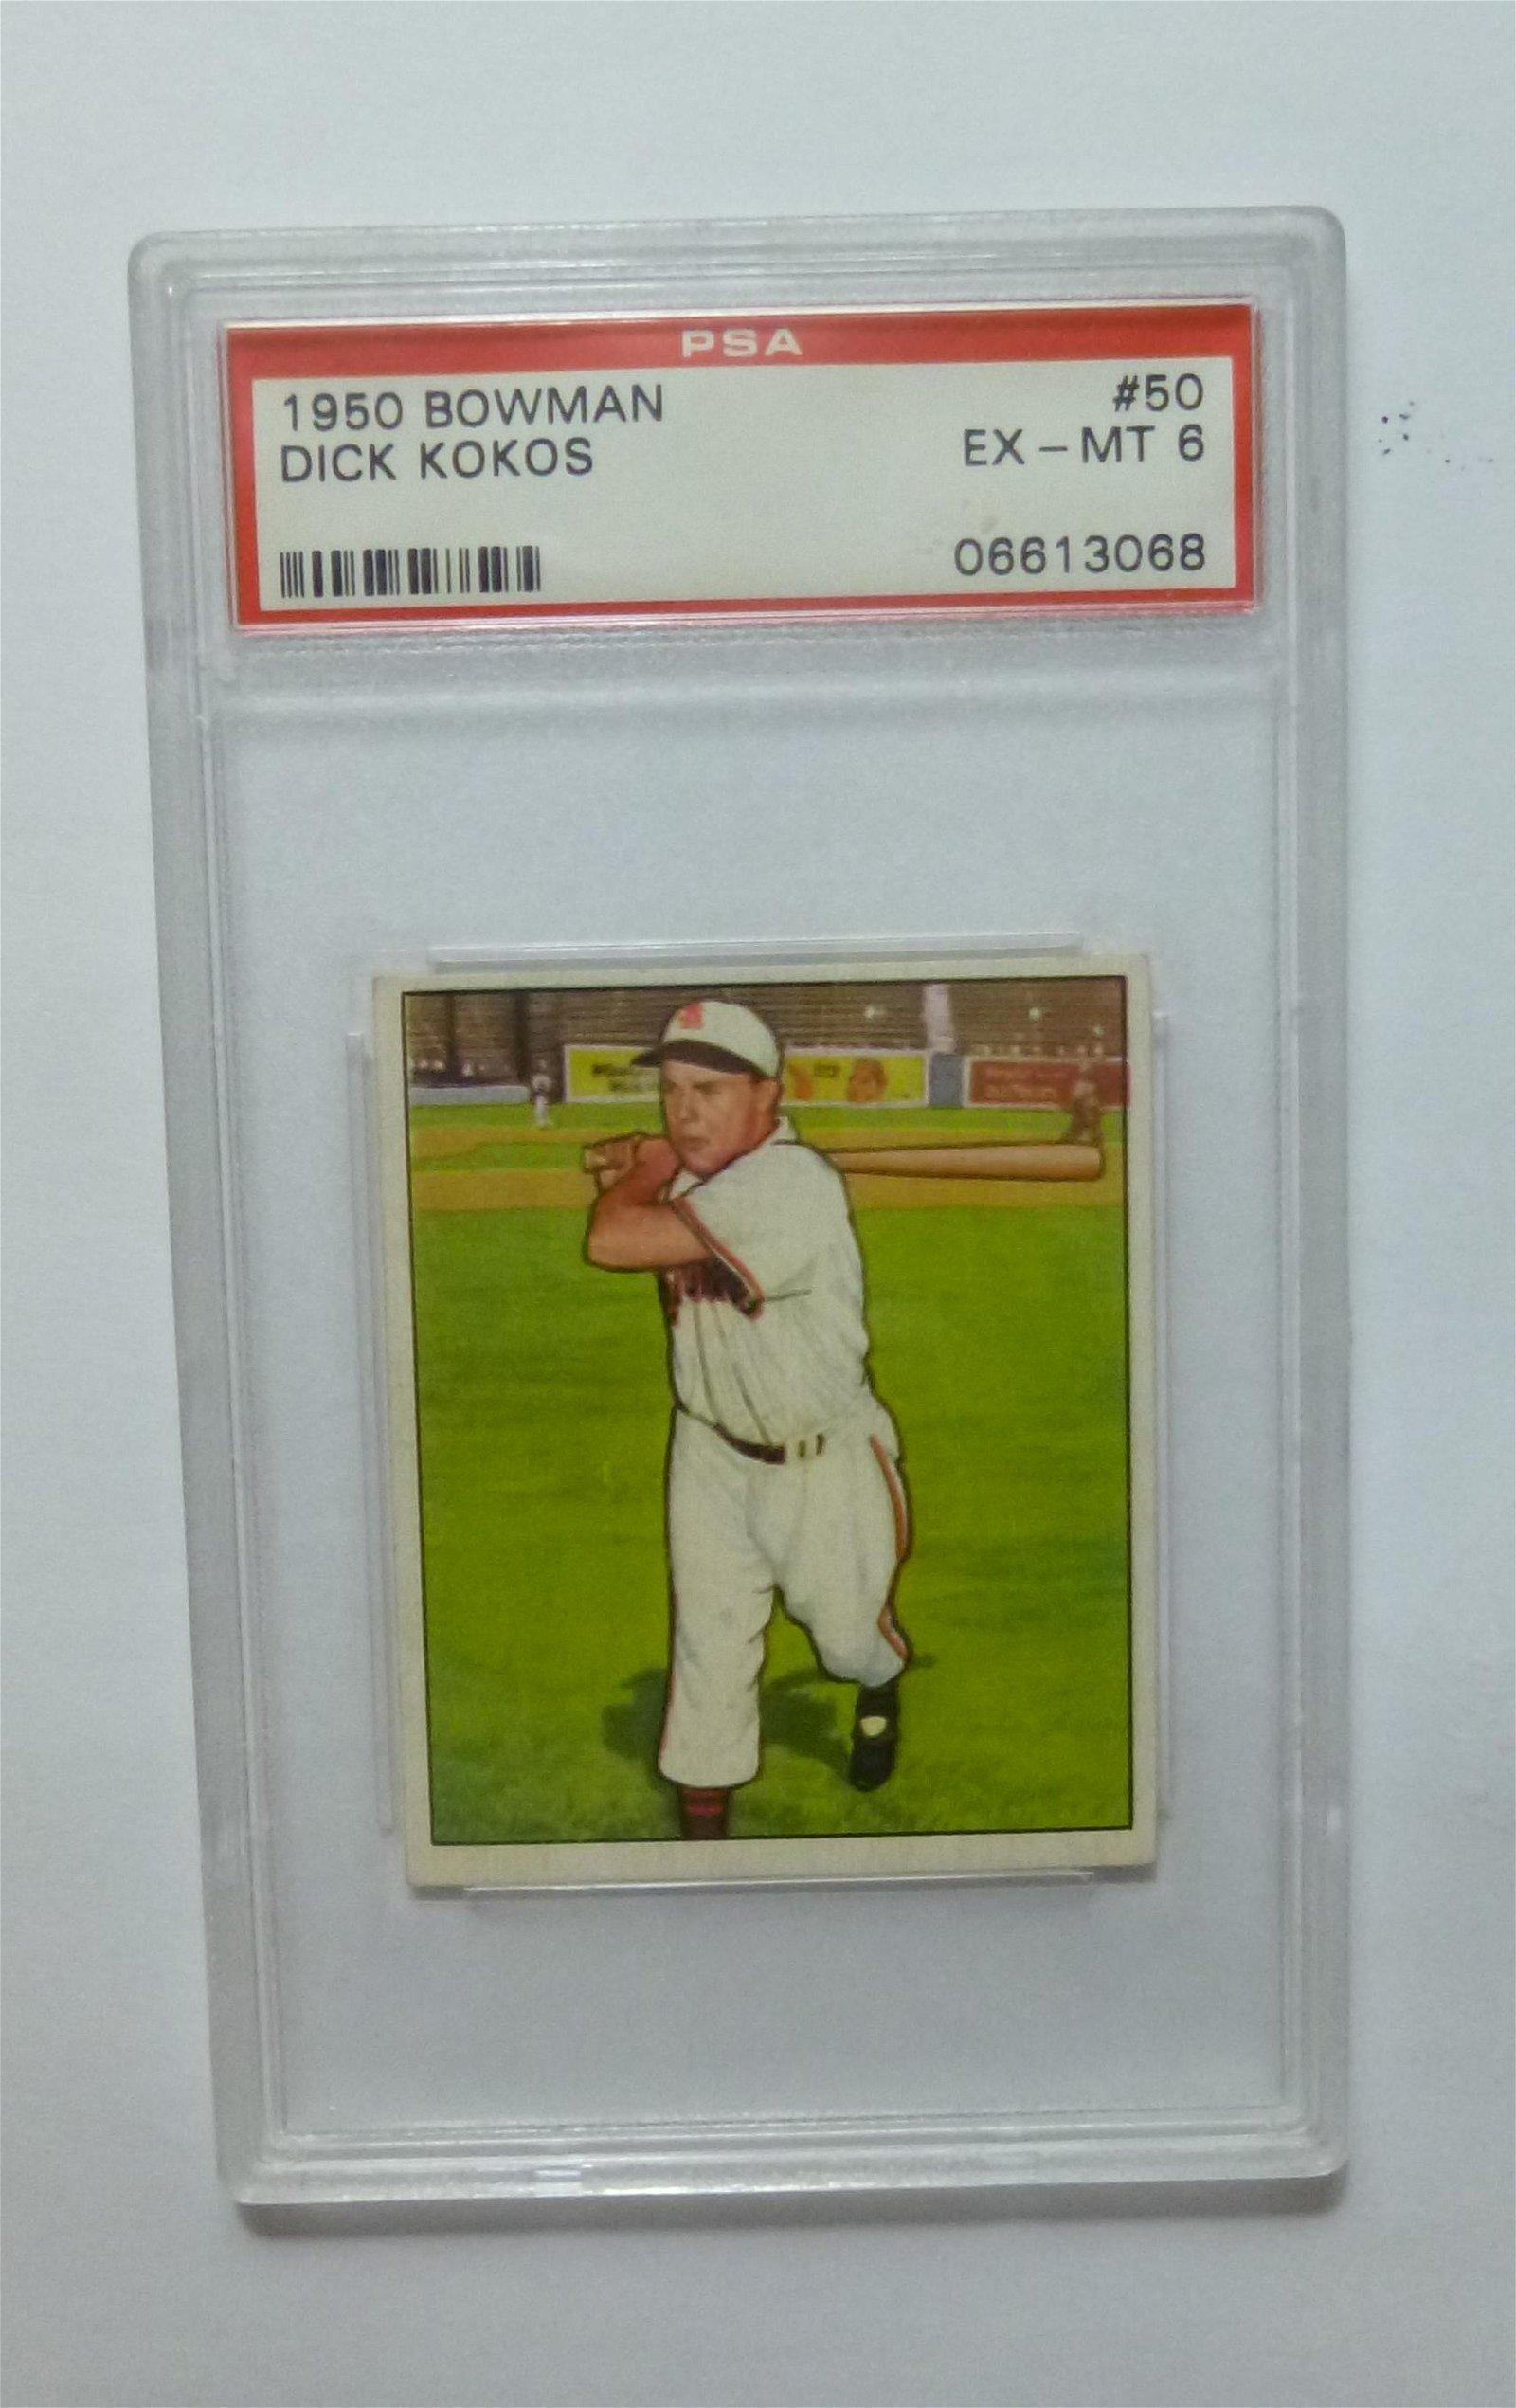 1950 Bowman #50 Dick Kokos PSA 6